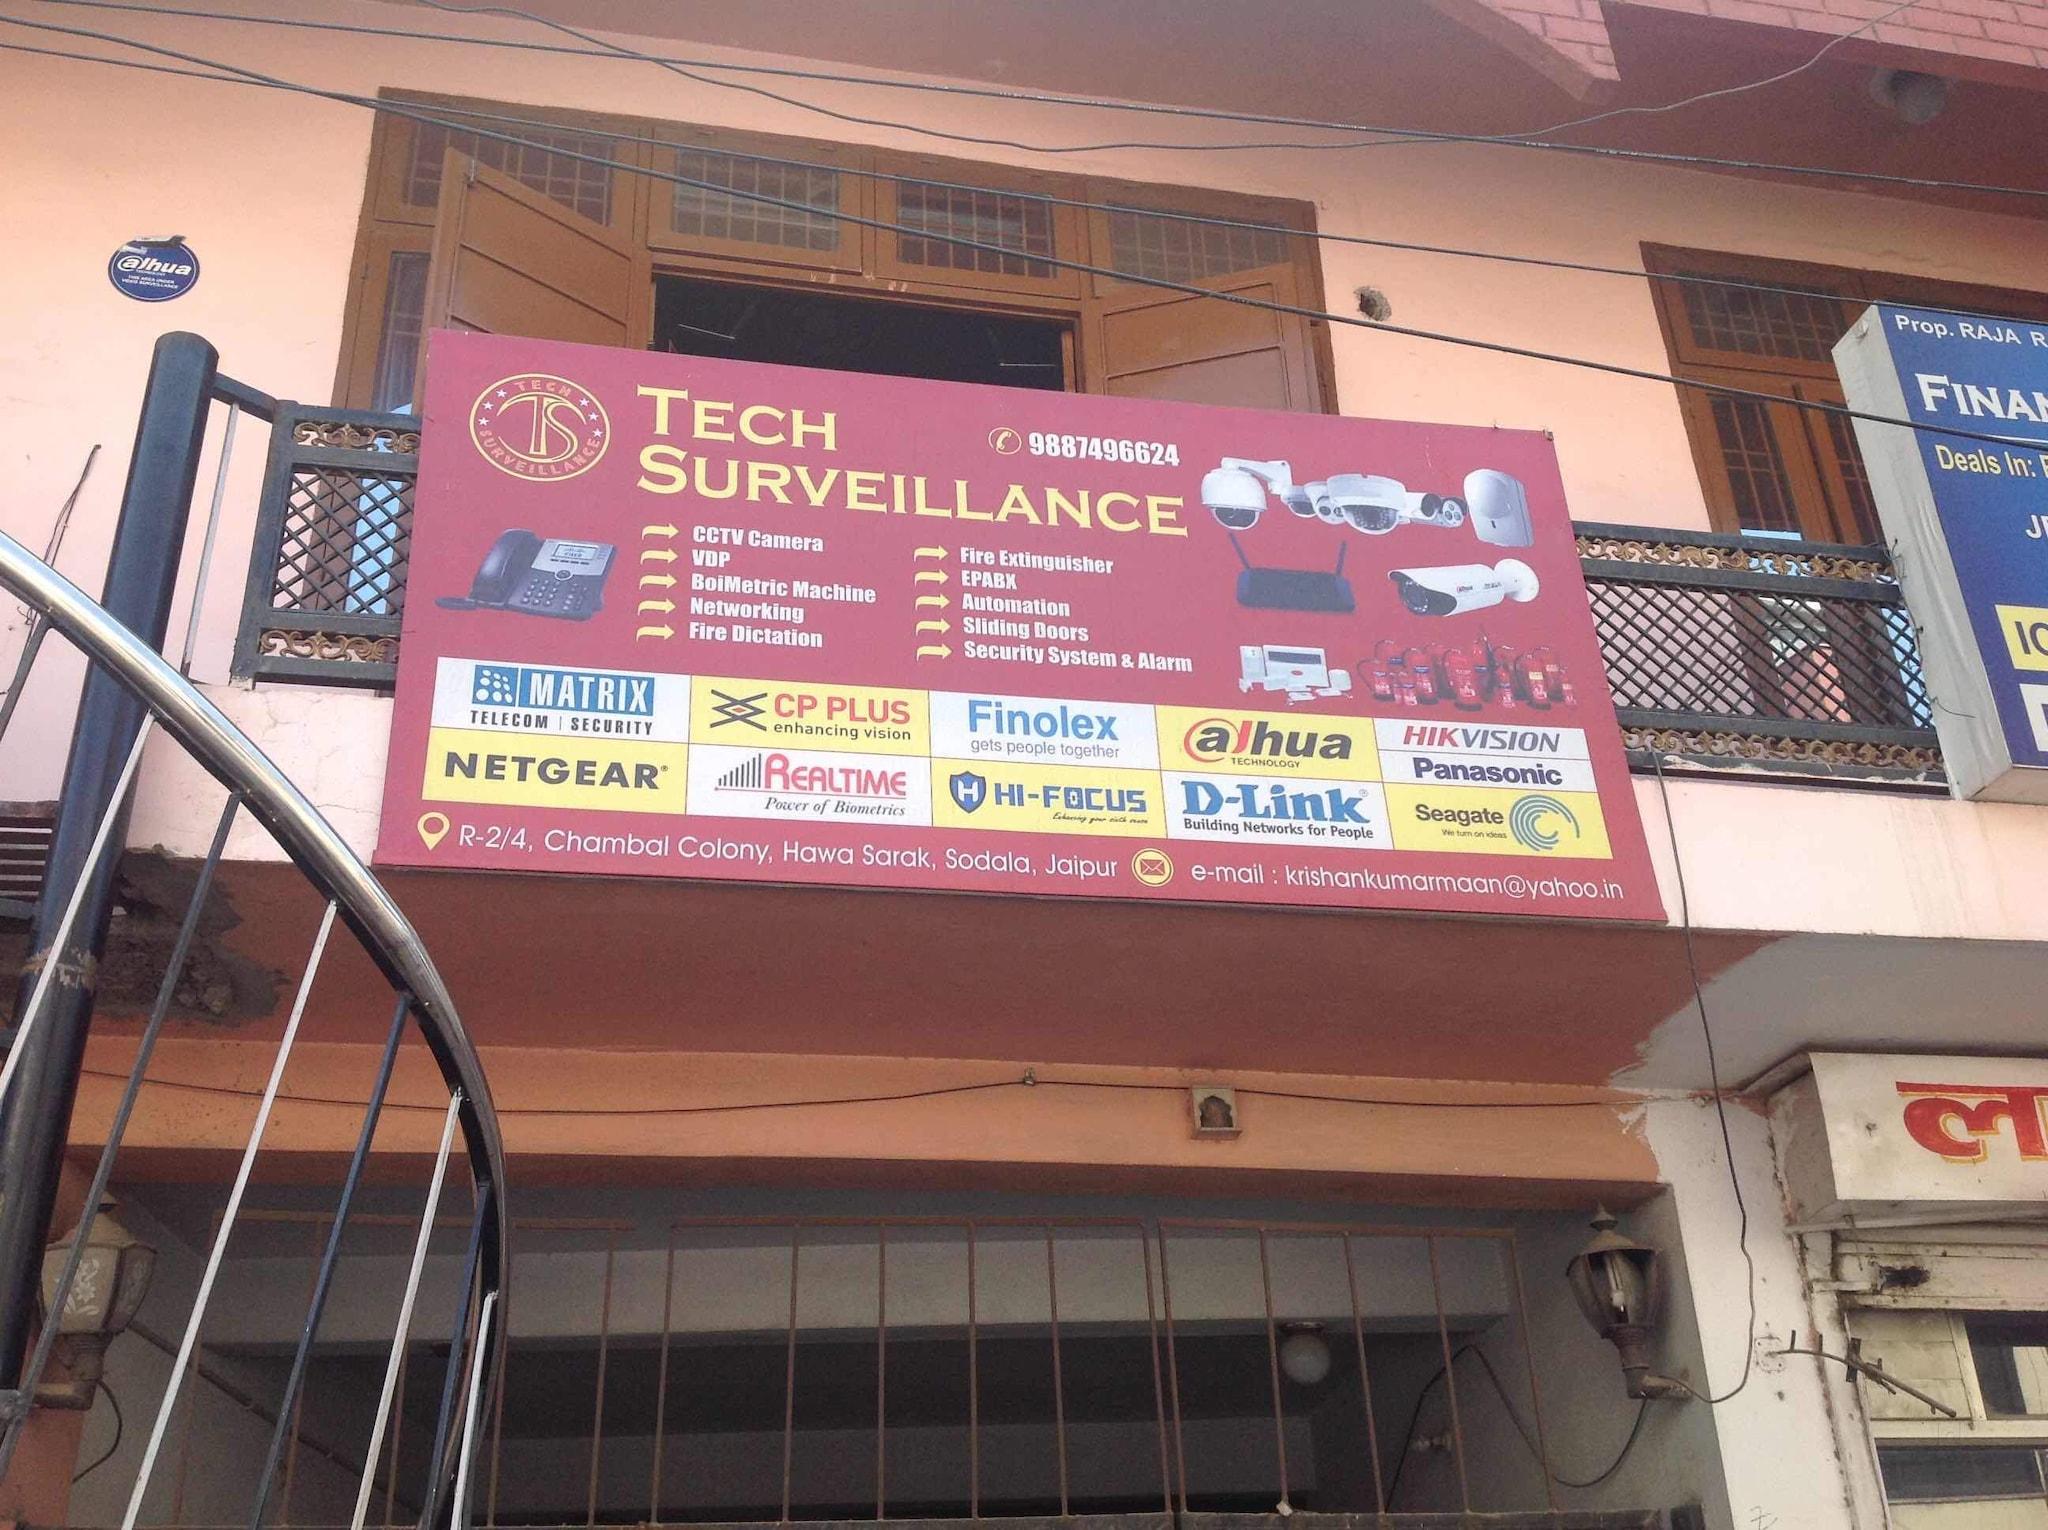 Top 100 CCTV Dealers in Raja Park - Best Surveillance CCTV